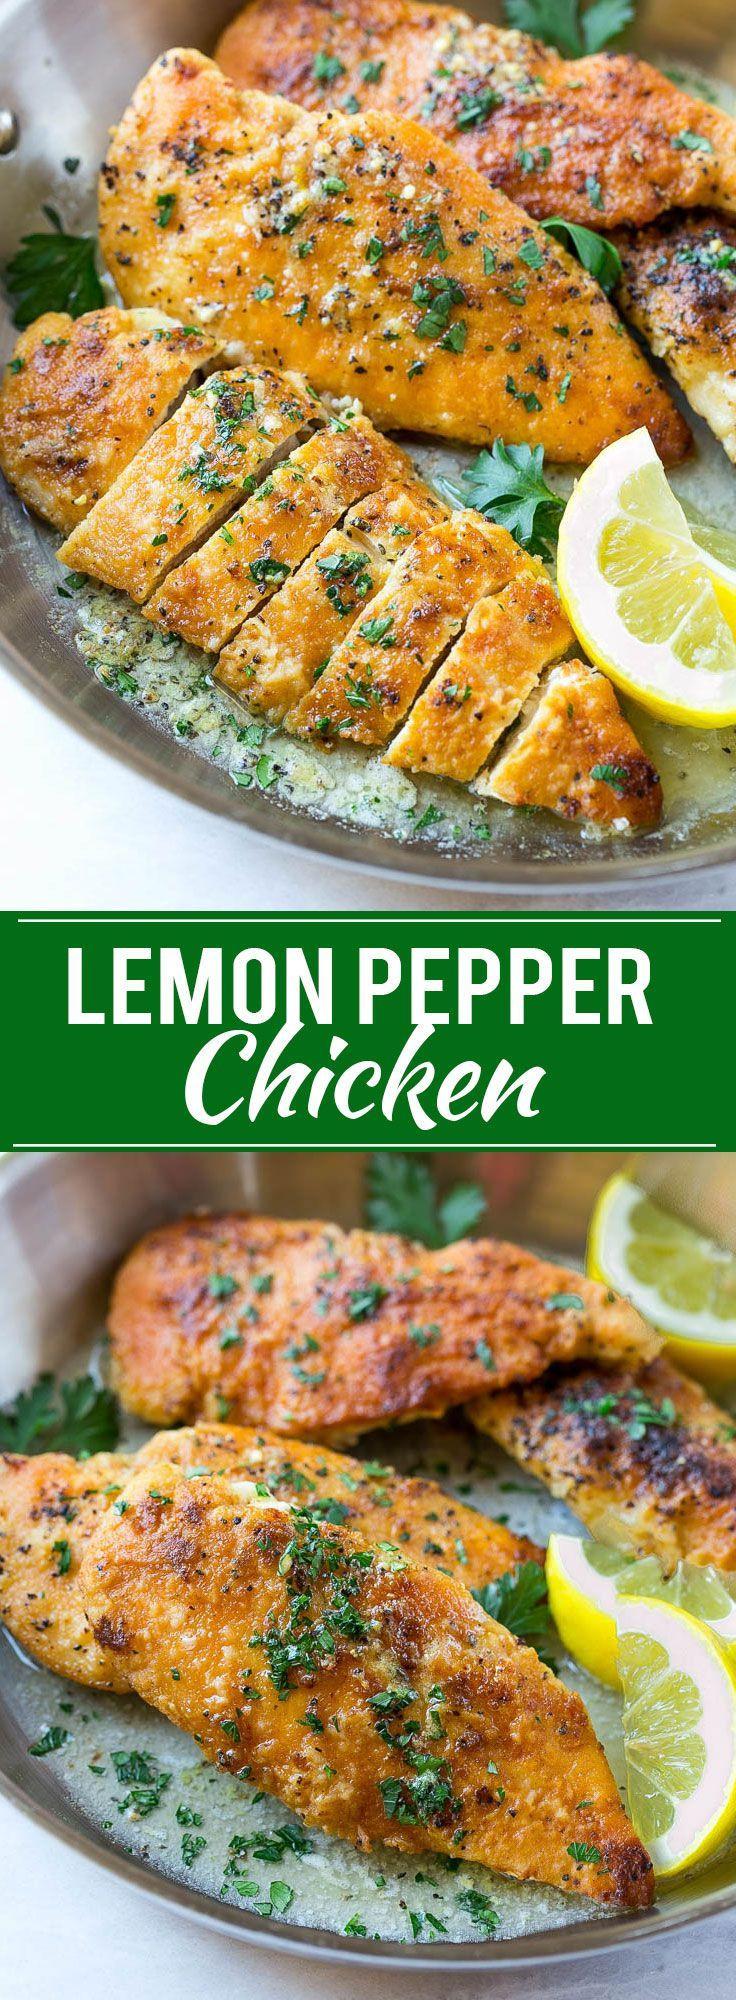 Healthy Chicken Recipes For Dinner  Best 25 Light meals for dinner ideas on Pinterest